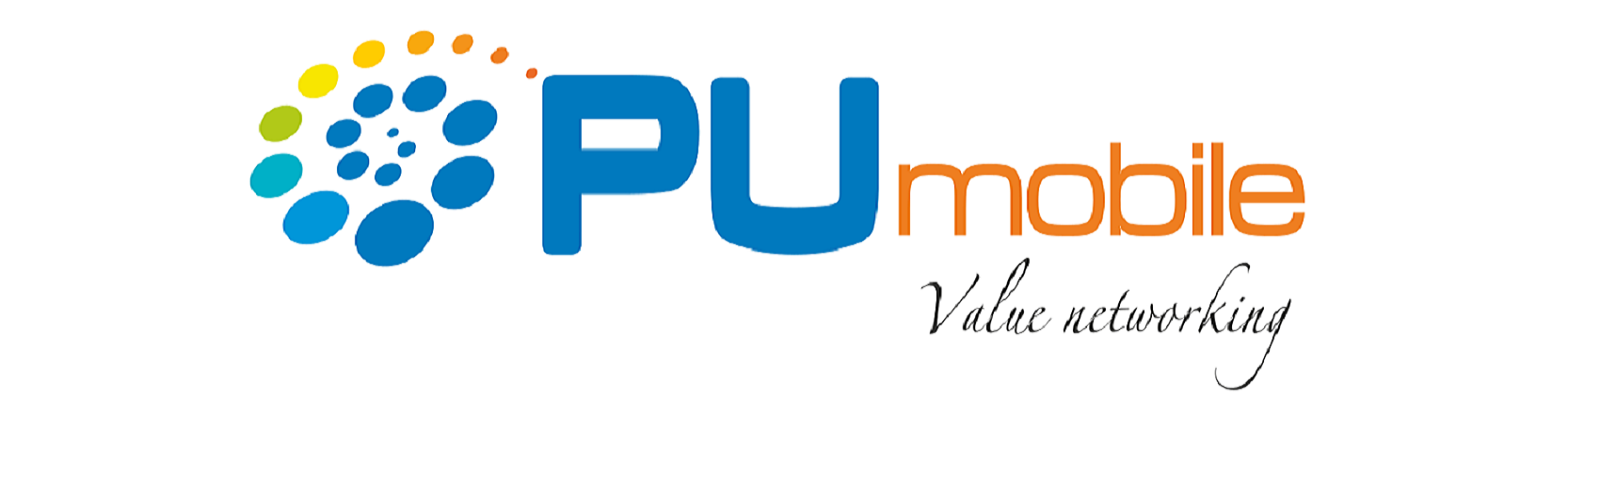 Phuonguyenmobile | Điện thoại cổ